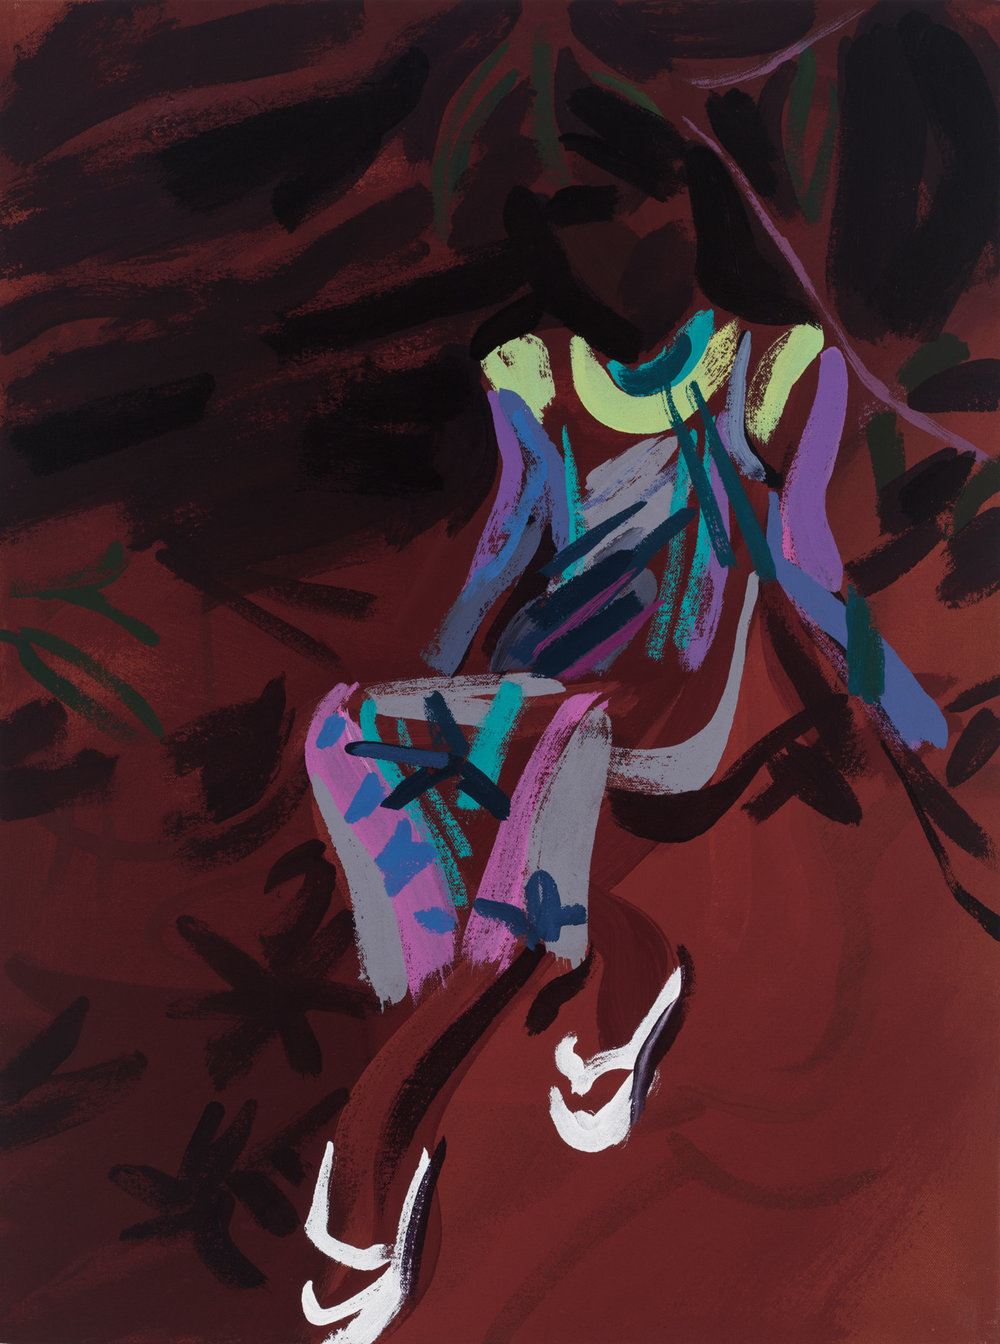 Neon Shadows #lightbright, 2015